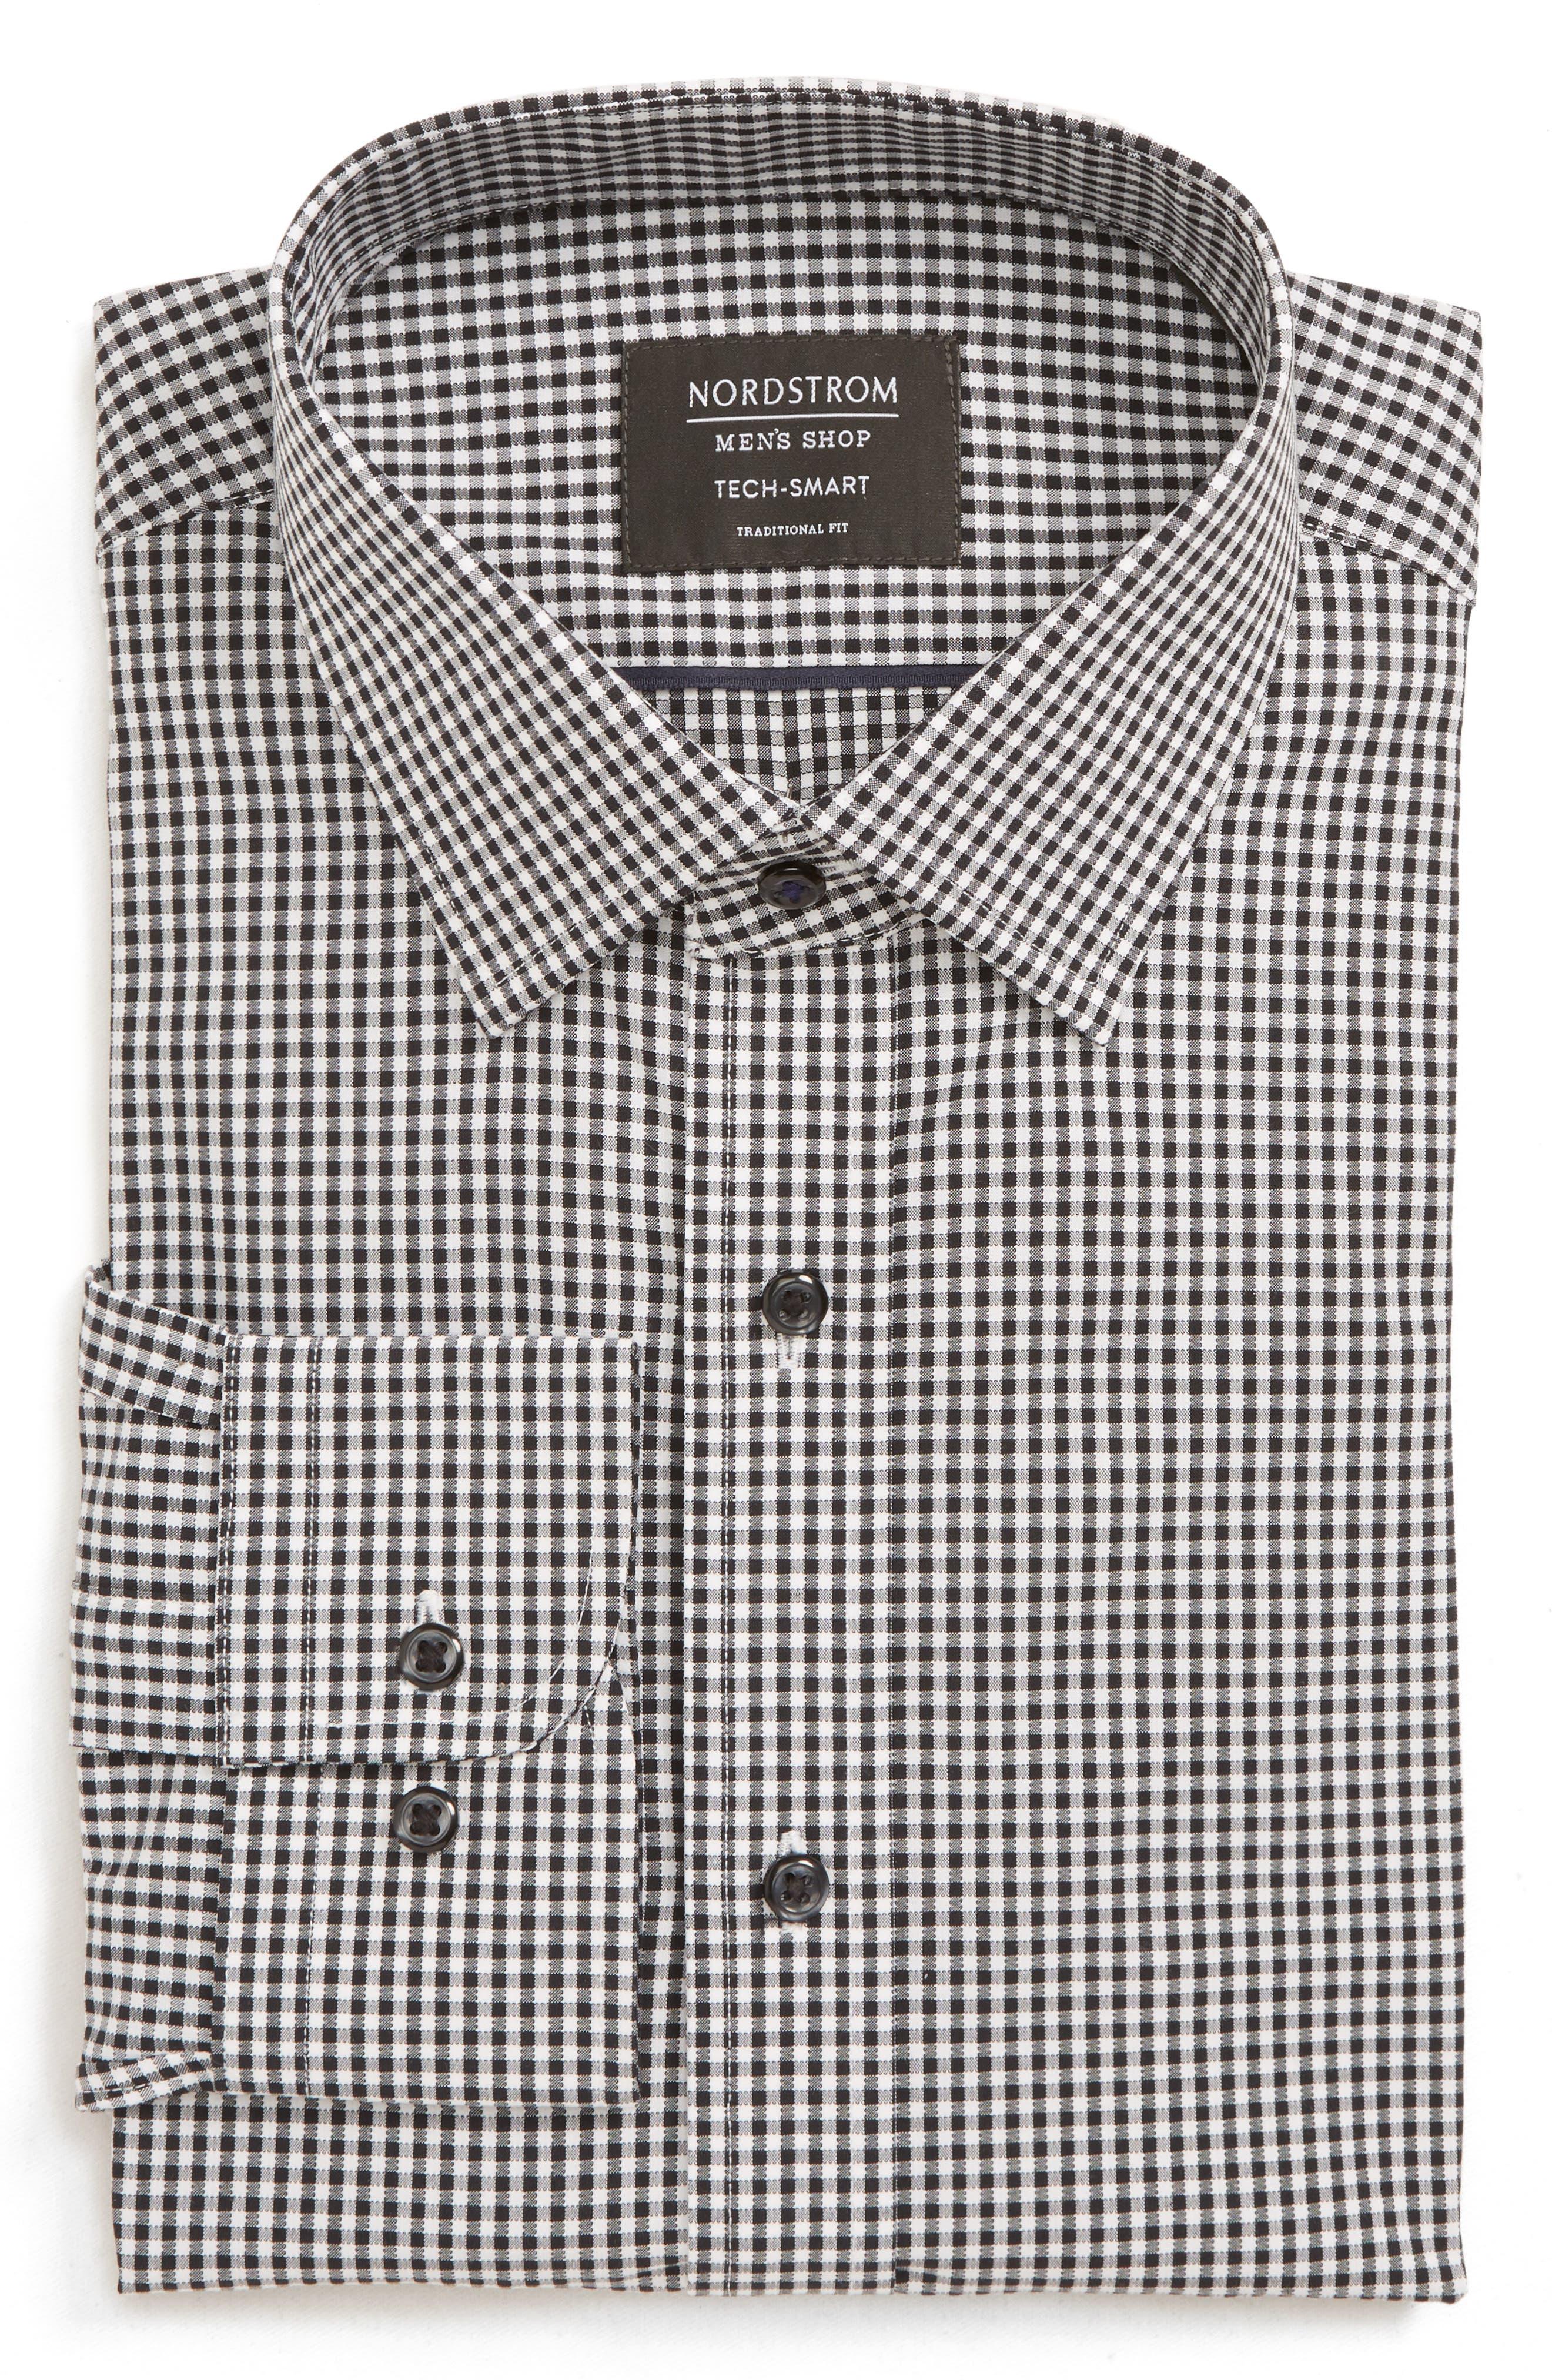 Tech-Smart Traditional Fit Check Stretch Dress Shirt,                             Main thumbnail 1, color,                             BLACK ROCK